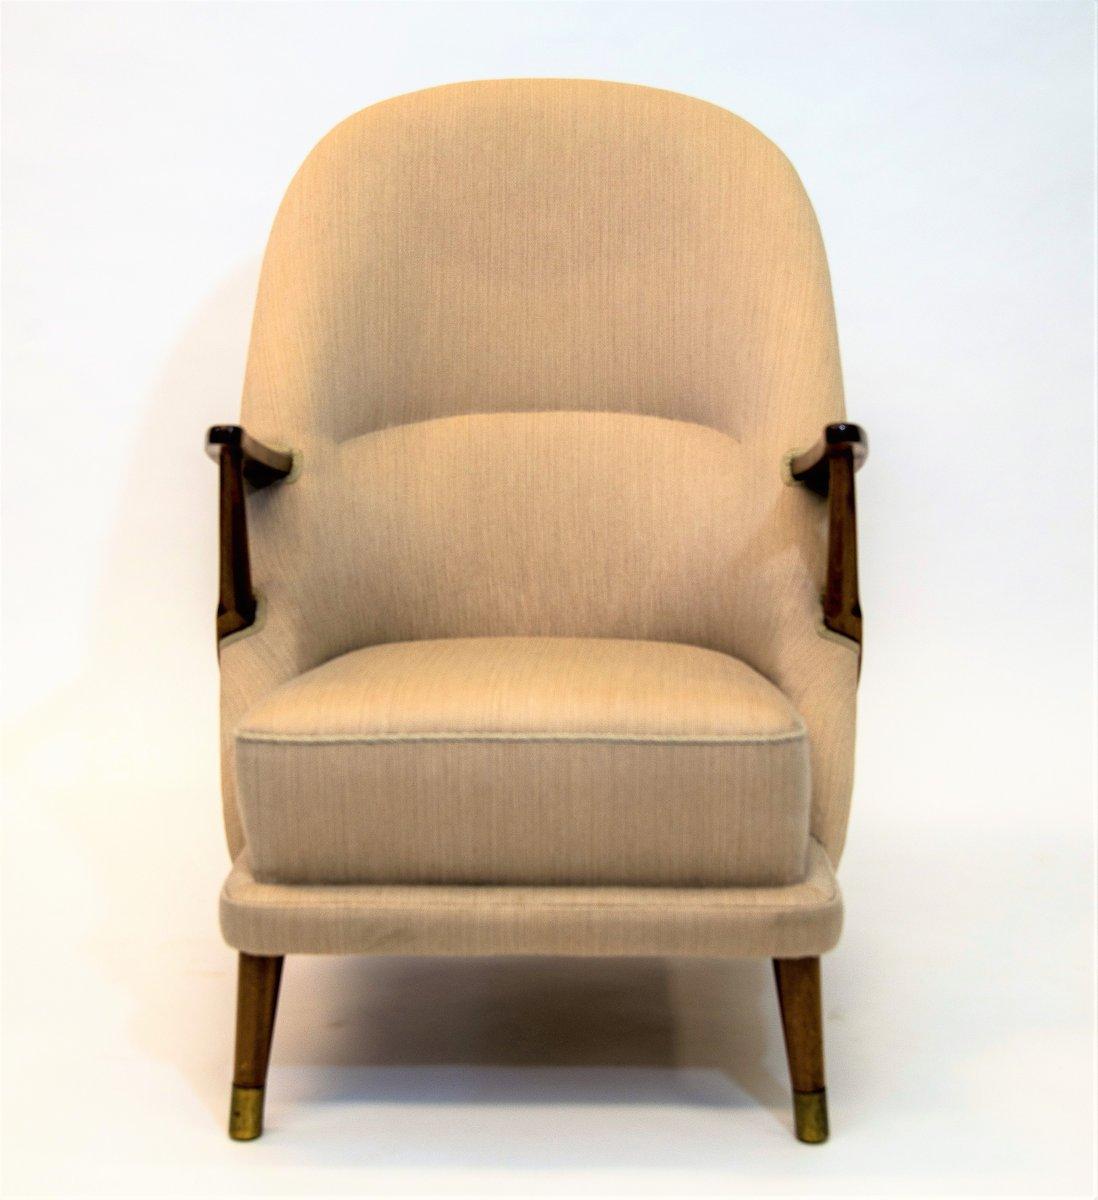 sessel mid century my blog. Black Bedroom Furniture Sets. Home Design Ideas